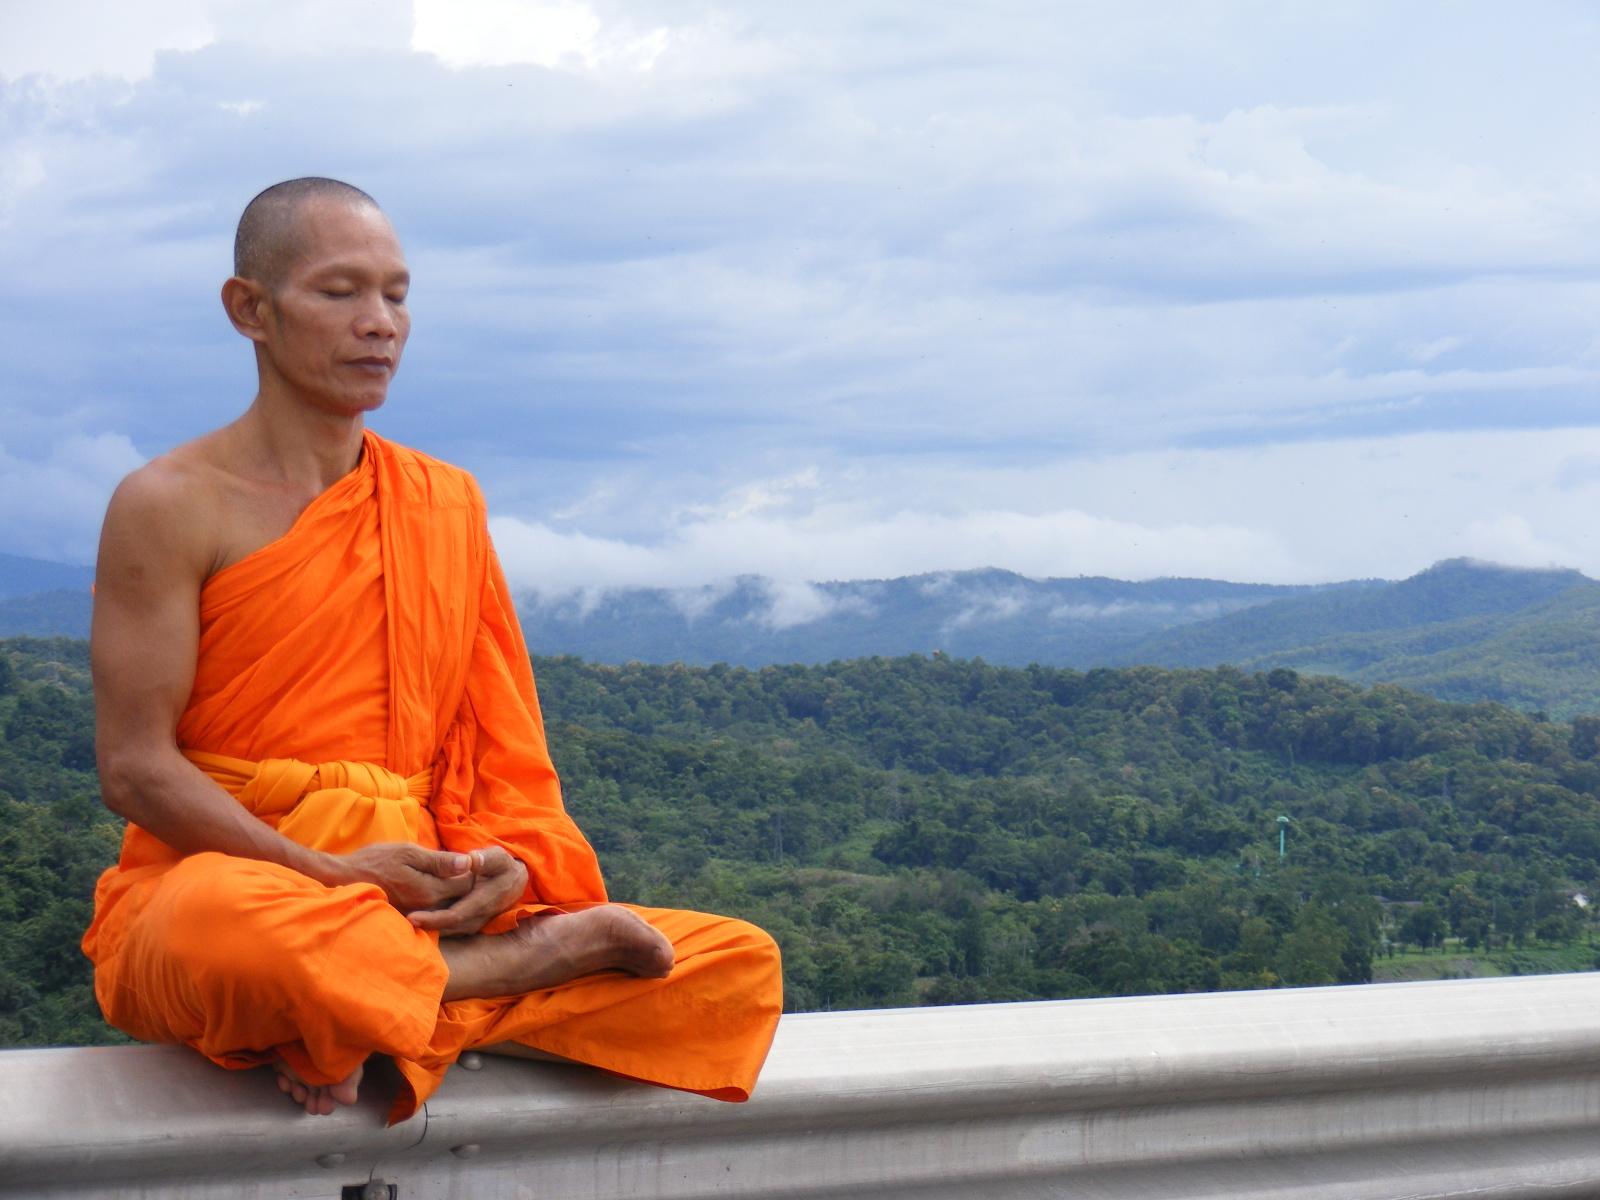 Image use via Creative Commons. Source:http://en.wikipedia.org/wiki/Buddhist_meditation